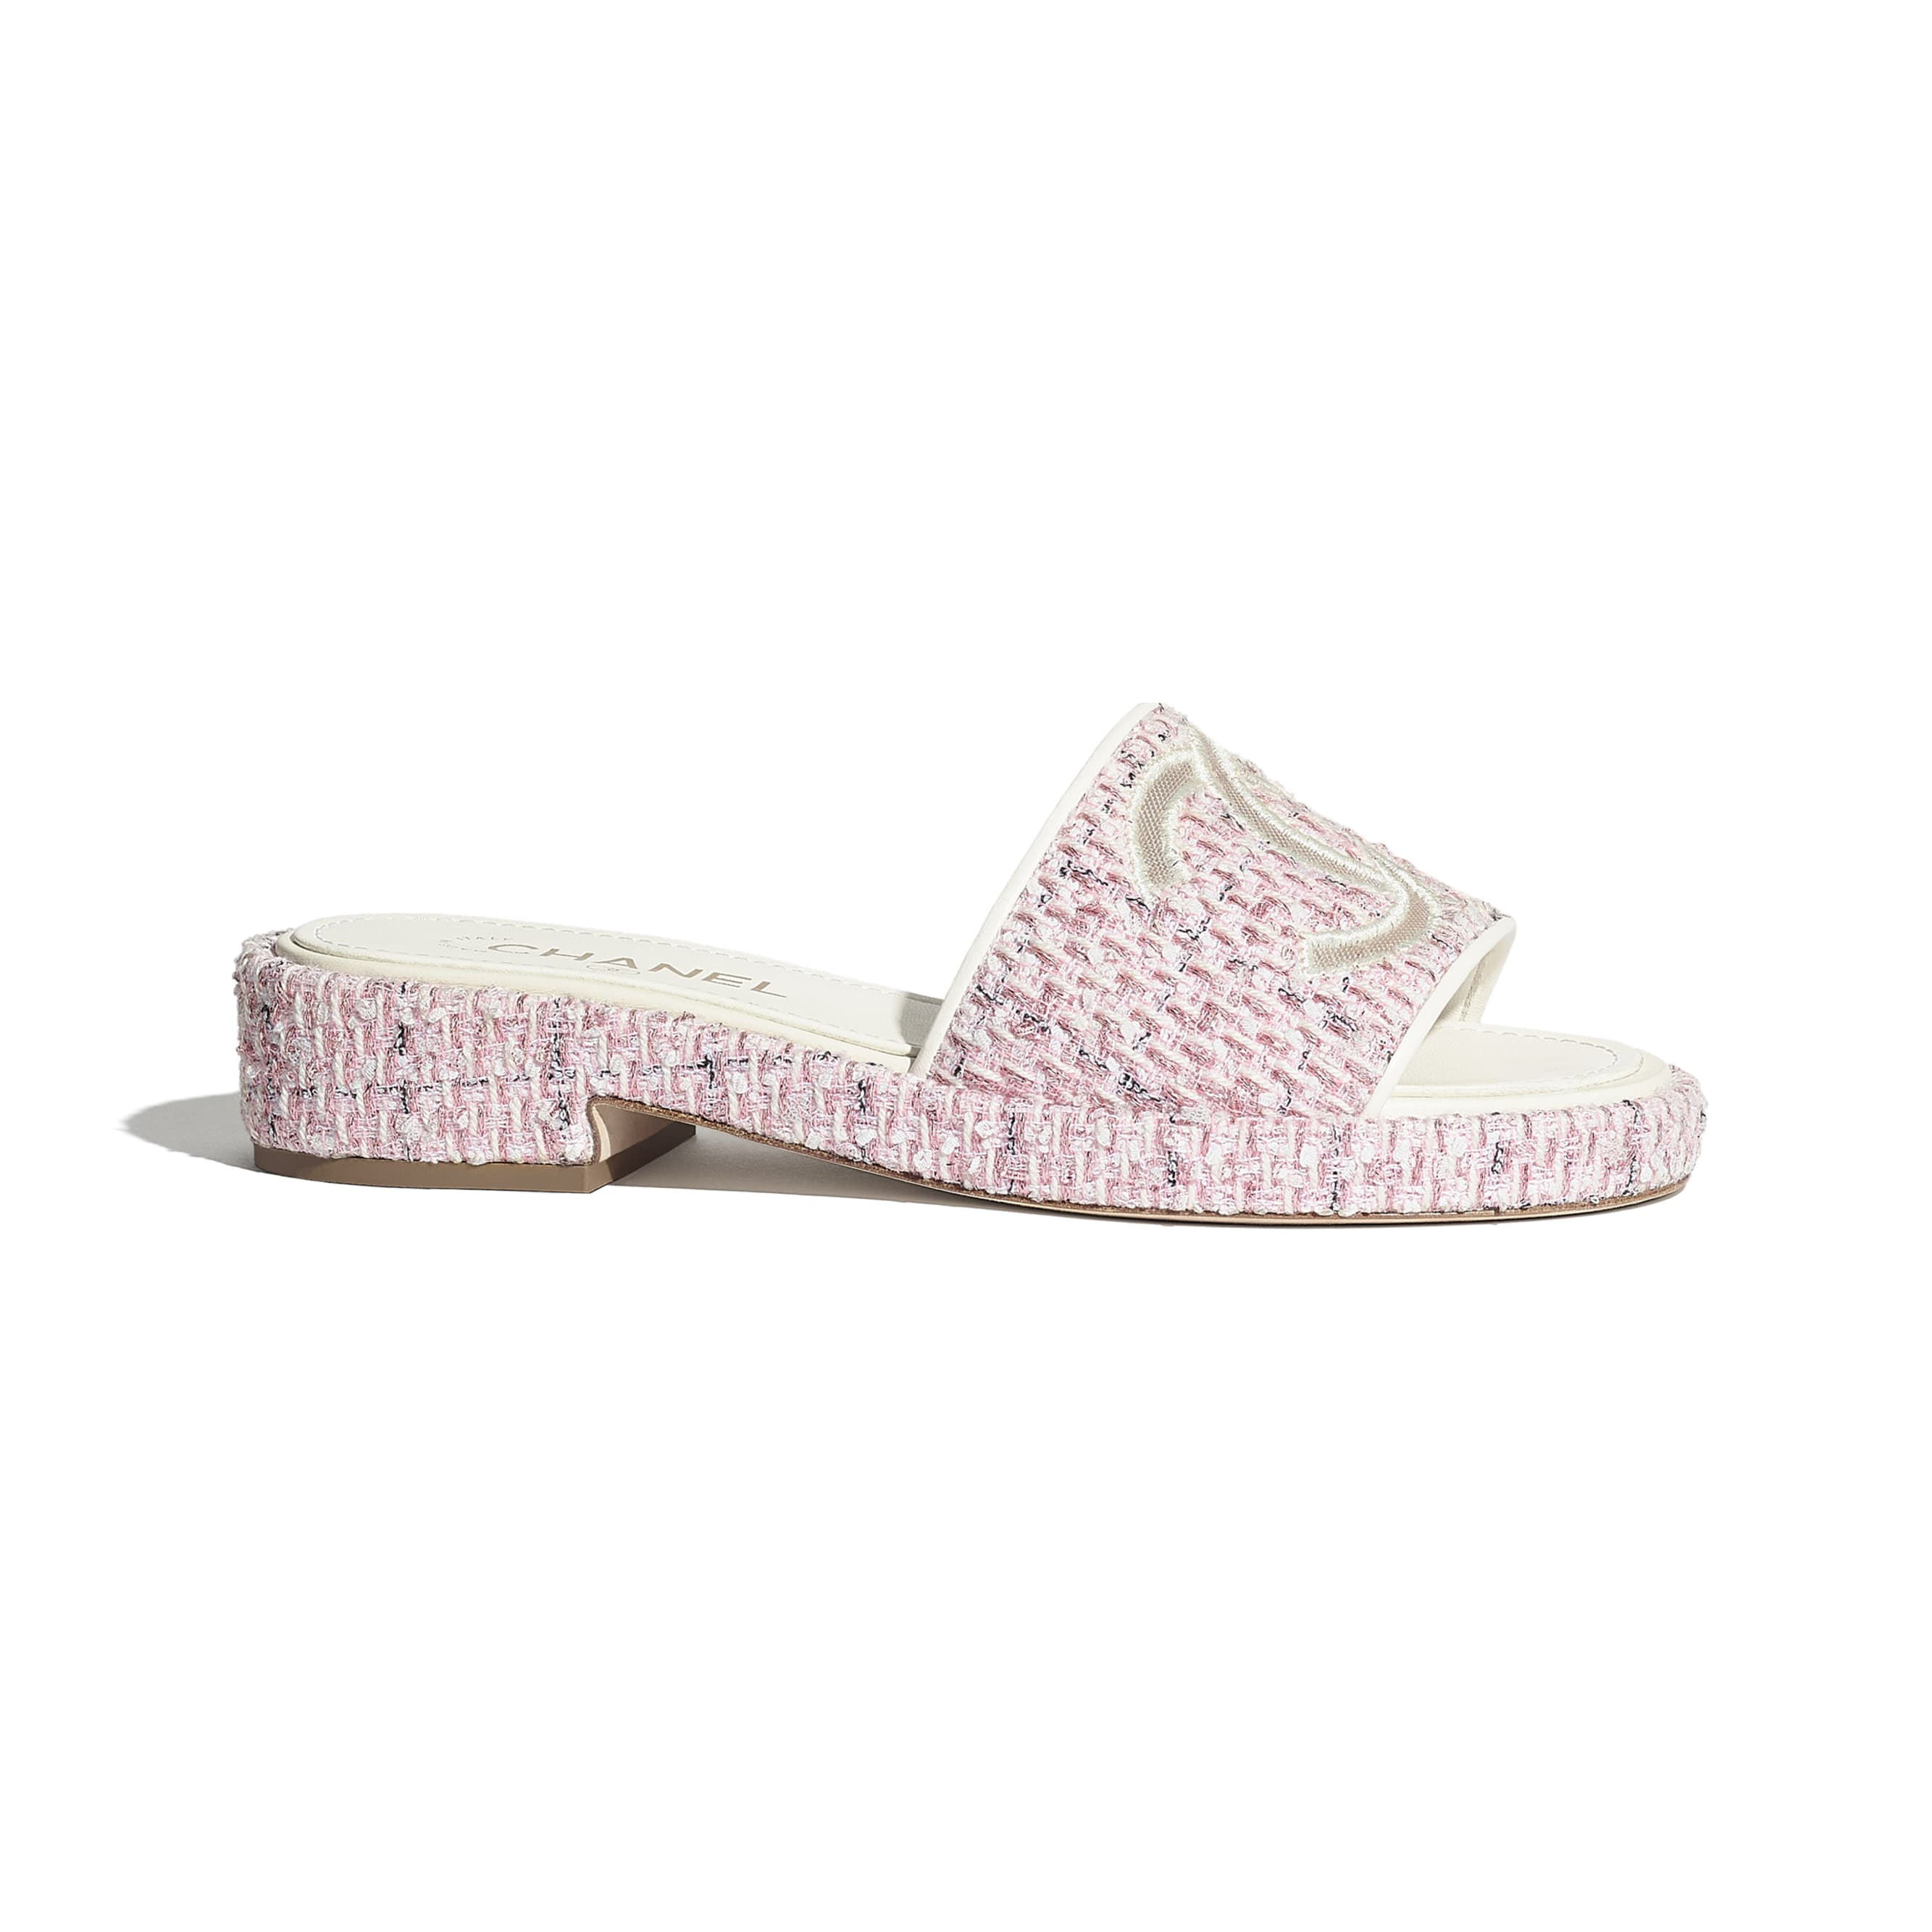 Mules - Pink - Tweed & Mesh - CHANEL - Default view - see standard sized version